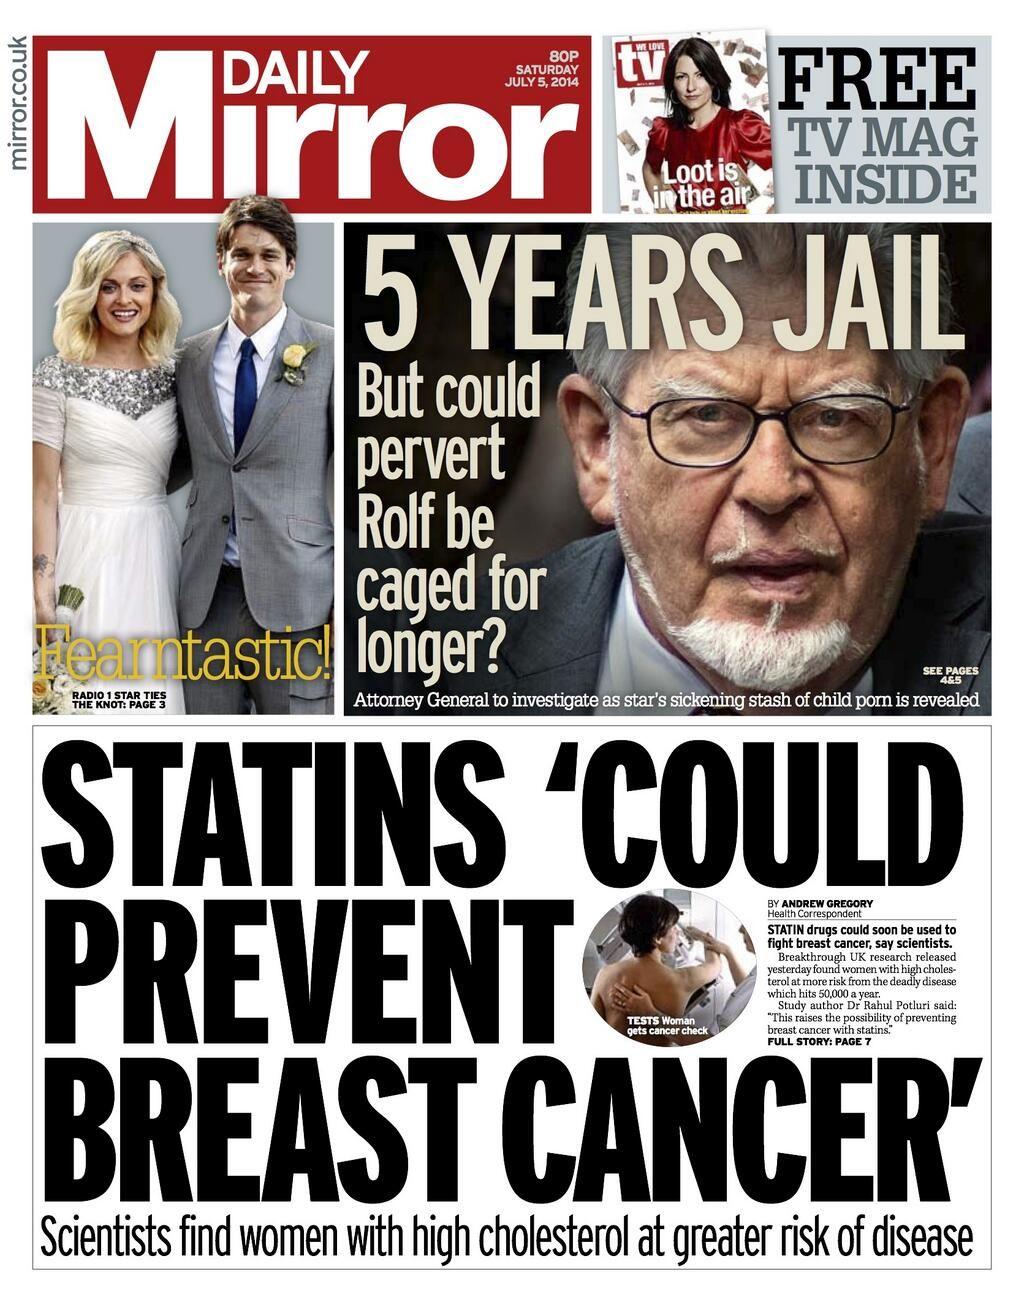 Daily Mirror, 5 July 2014 Newspaper headlines, Tabloid